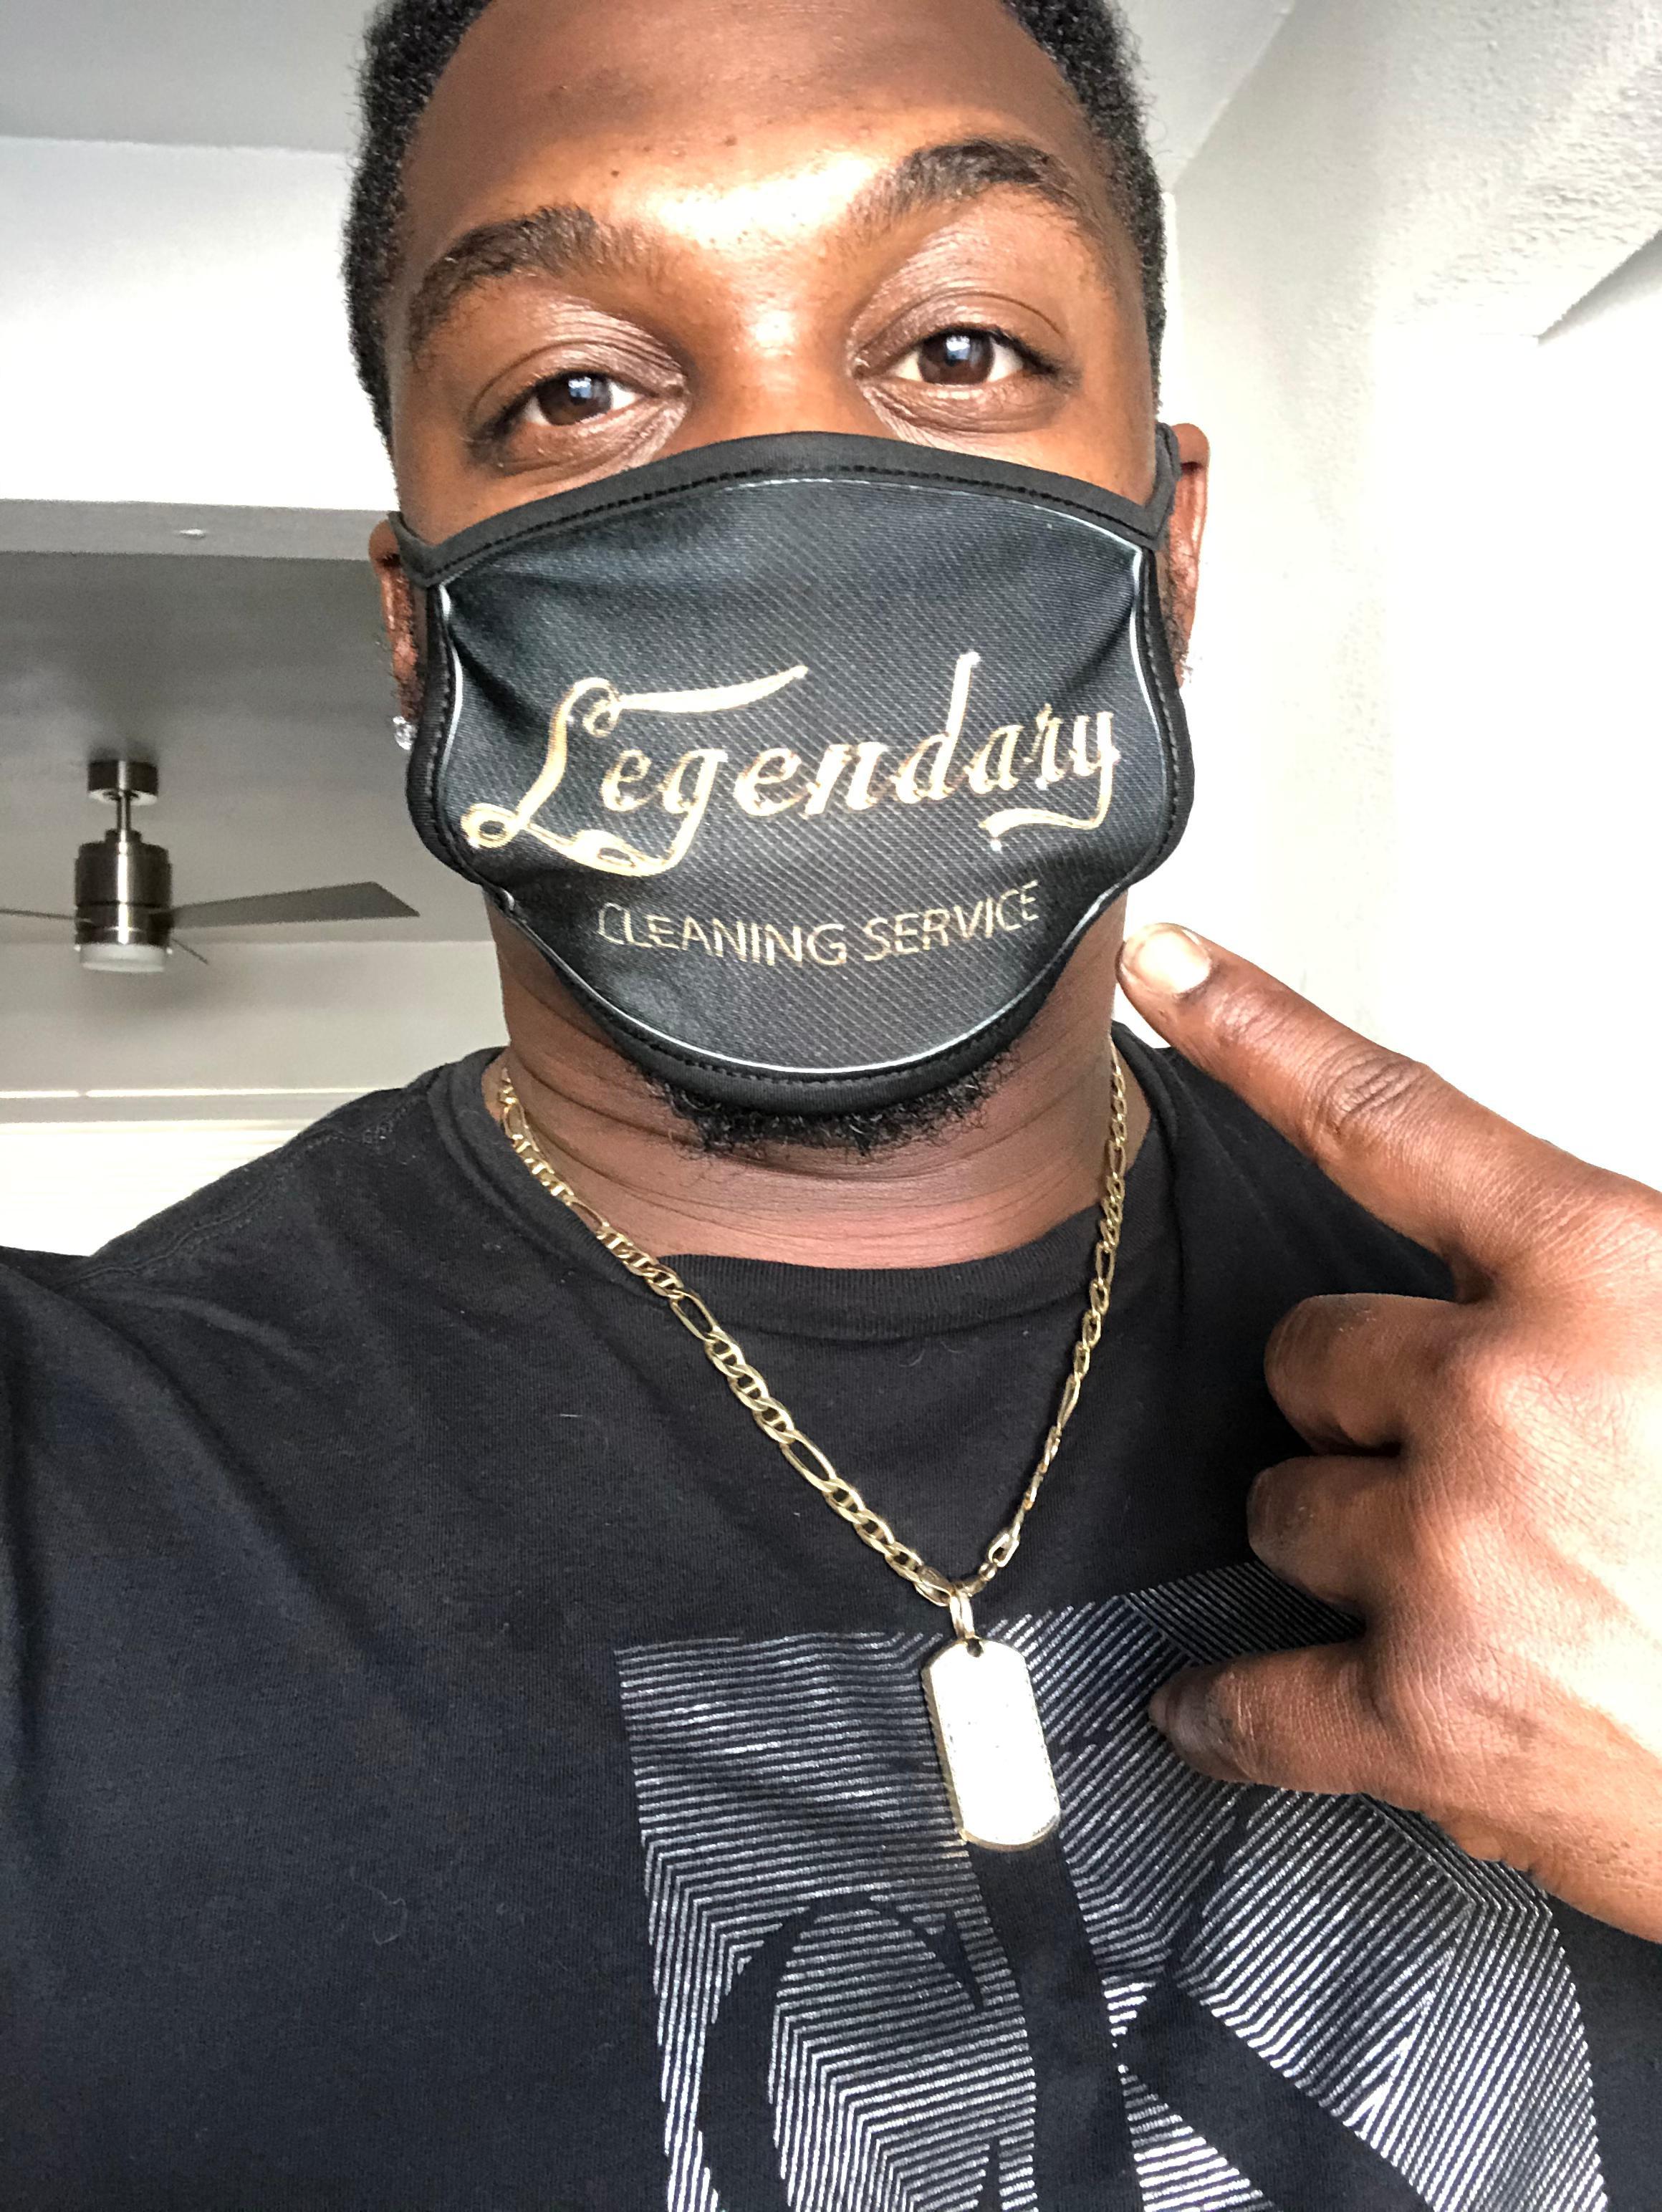 It's LegendaryCleaning LLC